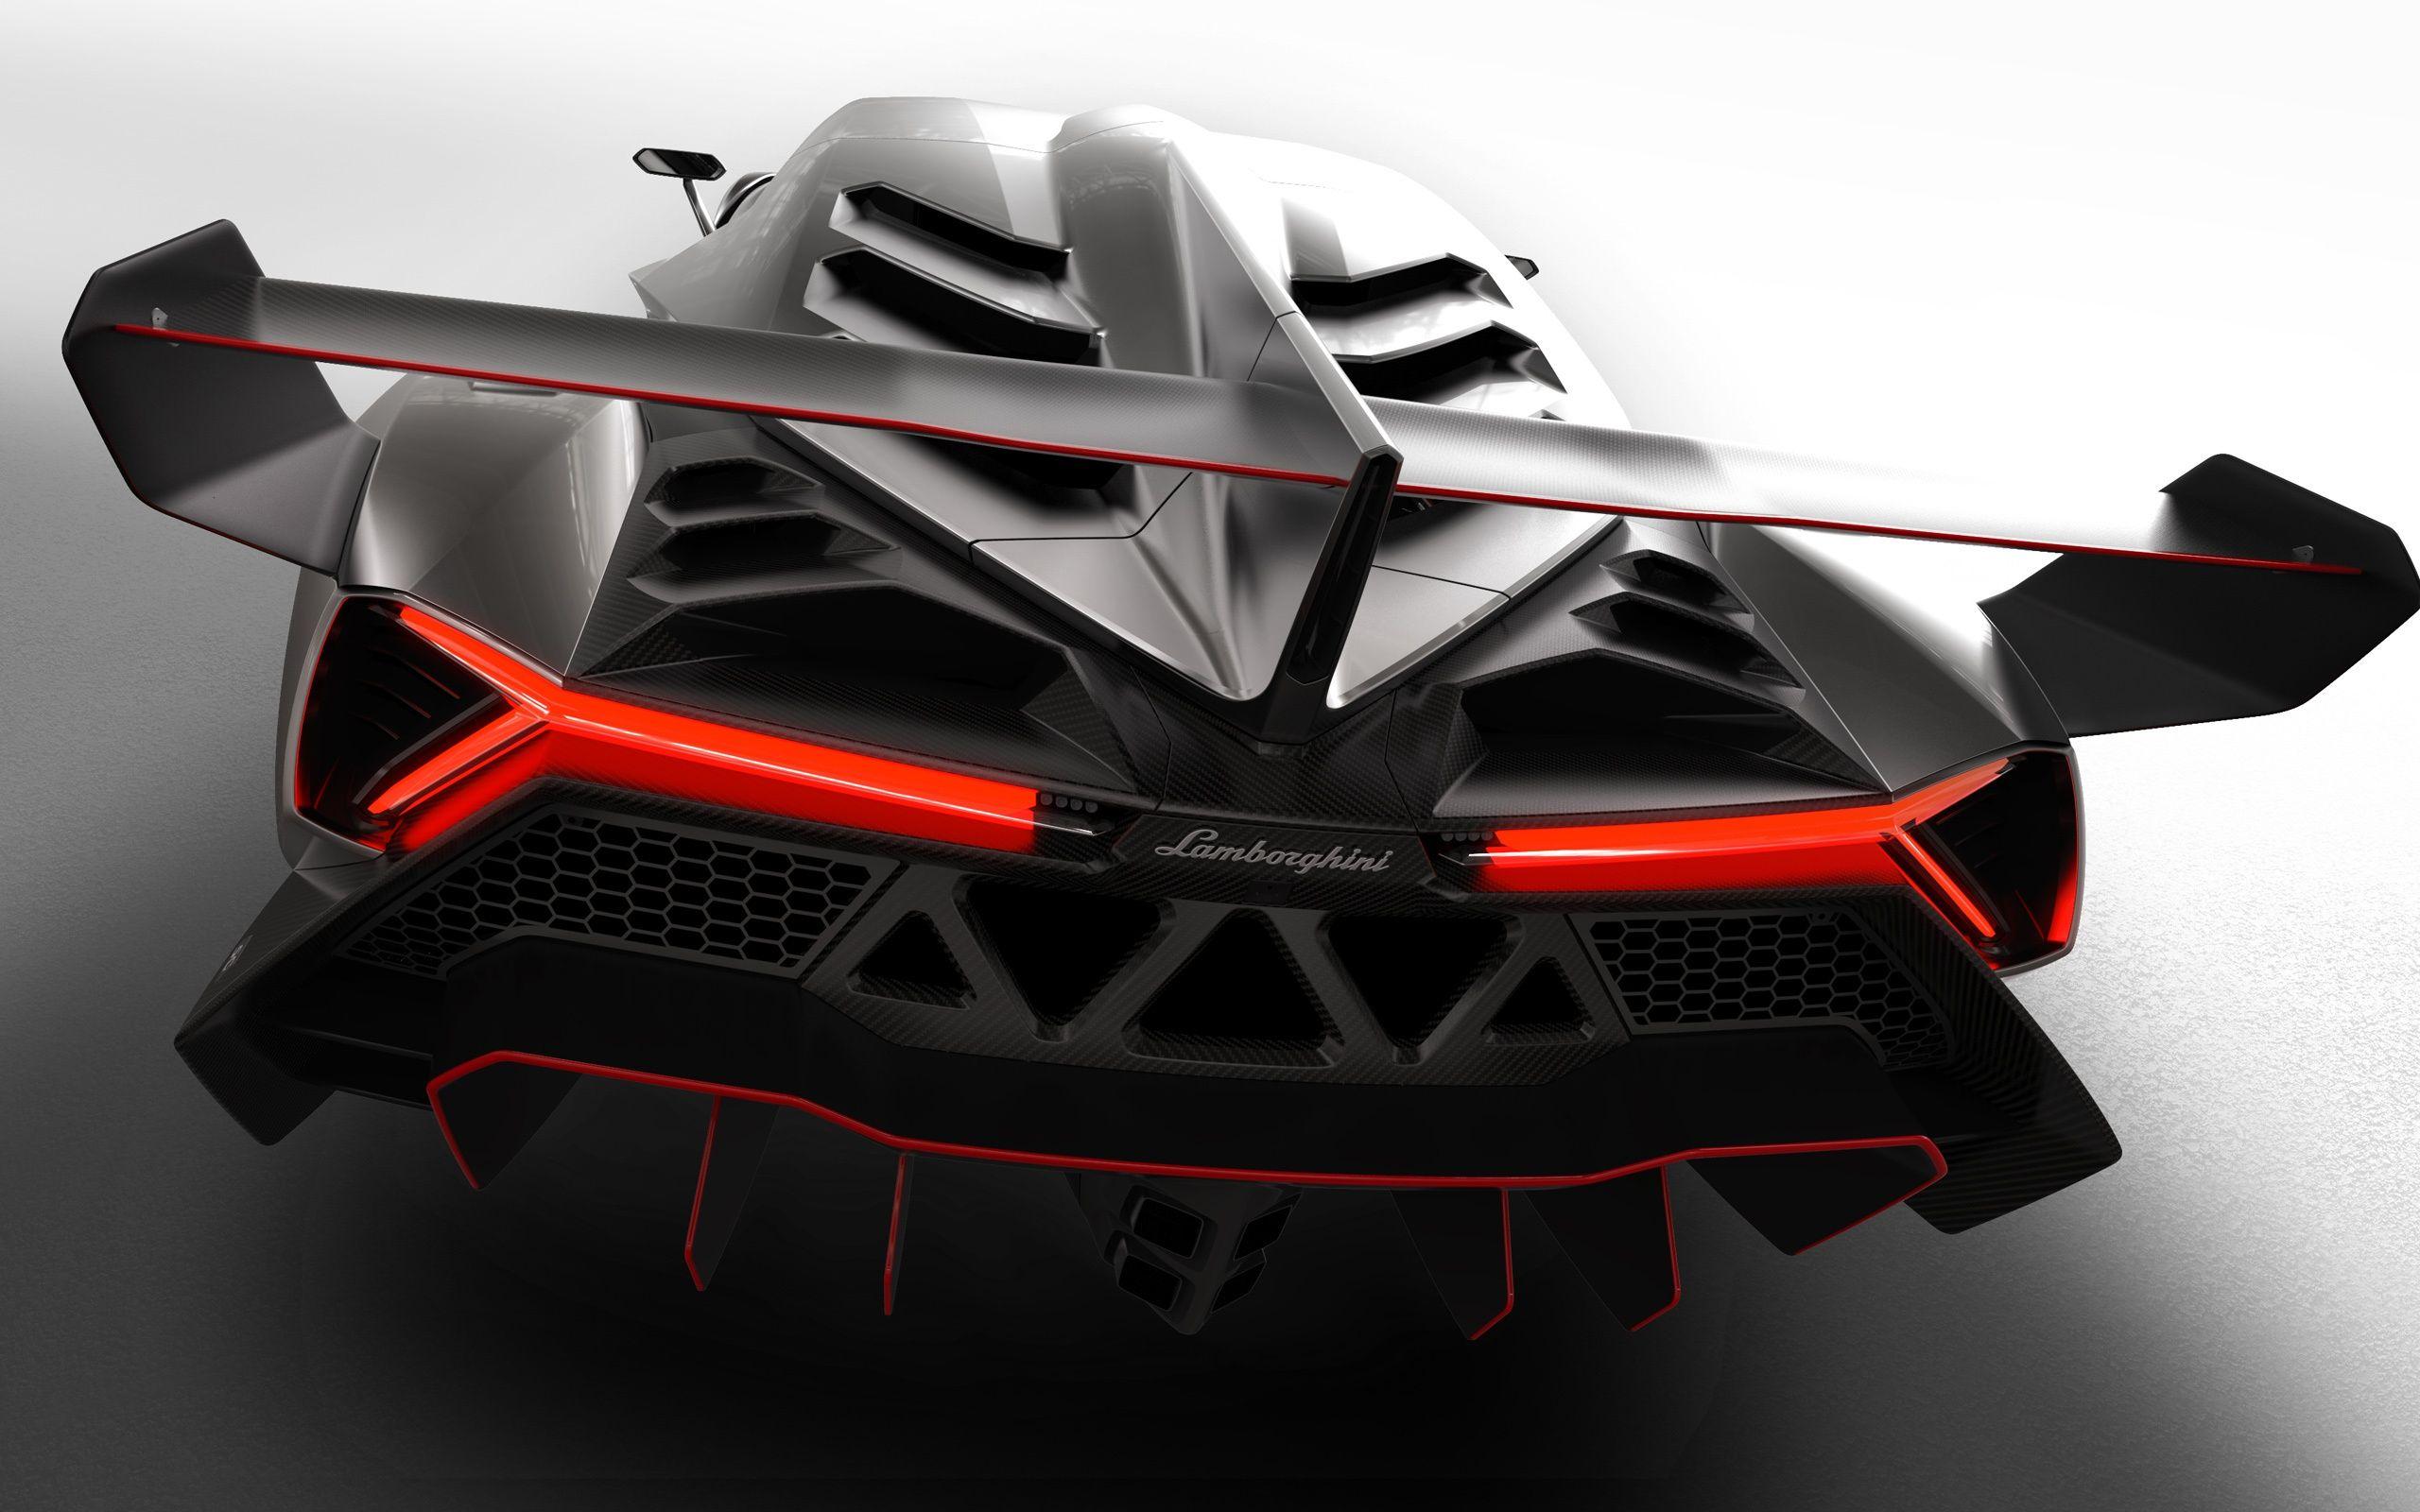 2013 Lamborghini Veneno, traseira close-up Papéis de Parede - 2560x1600